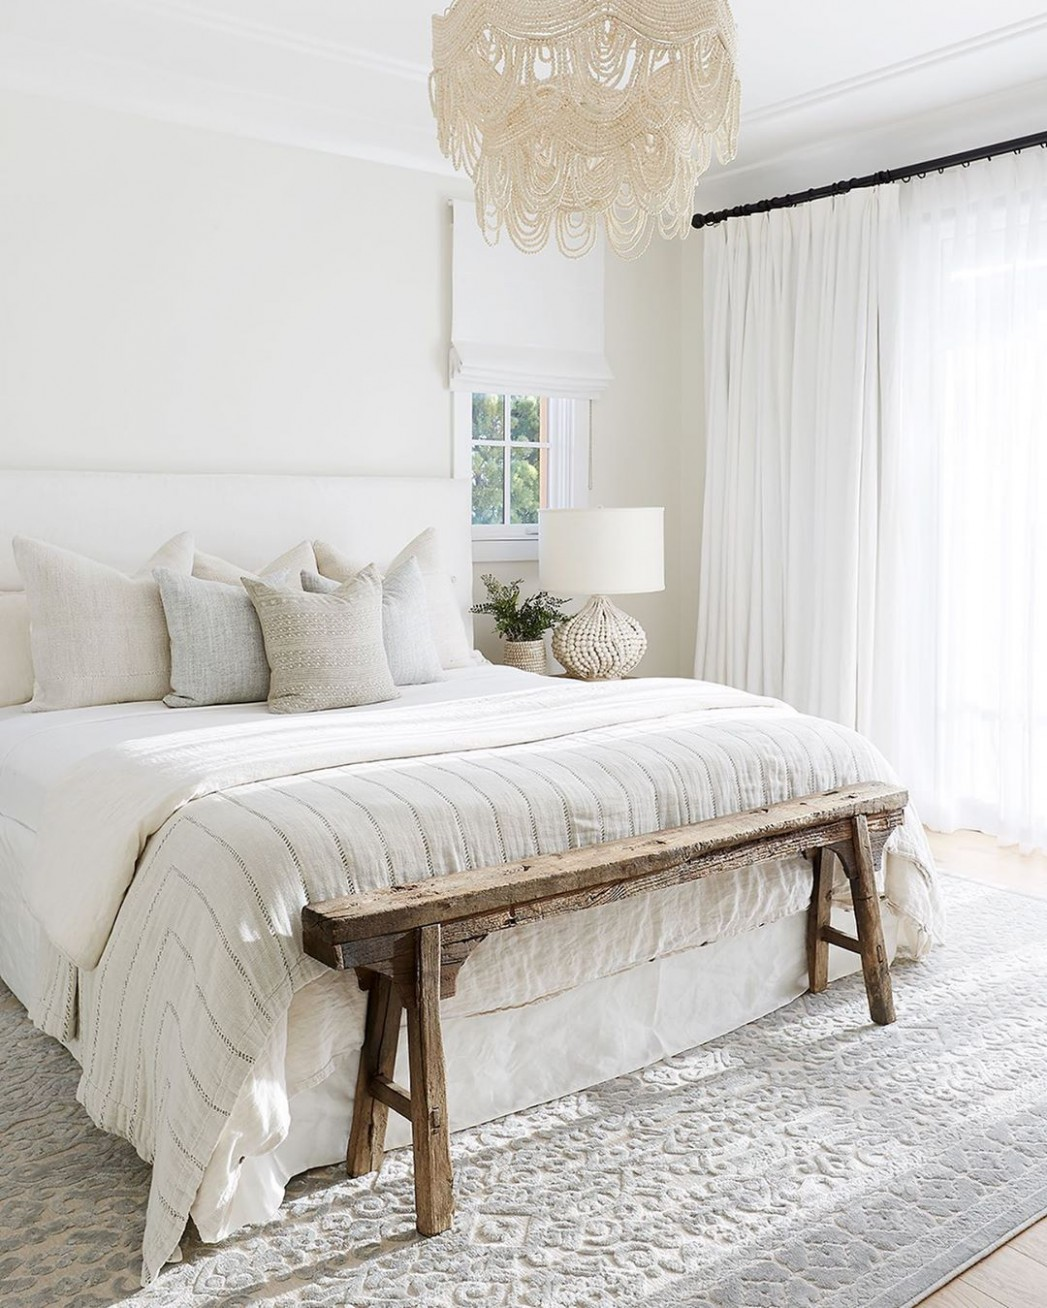 10 Best Bedroom Curtain Ideas - Easy Ideas for Bedroom Window  - Bedroom Ideas Curtains